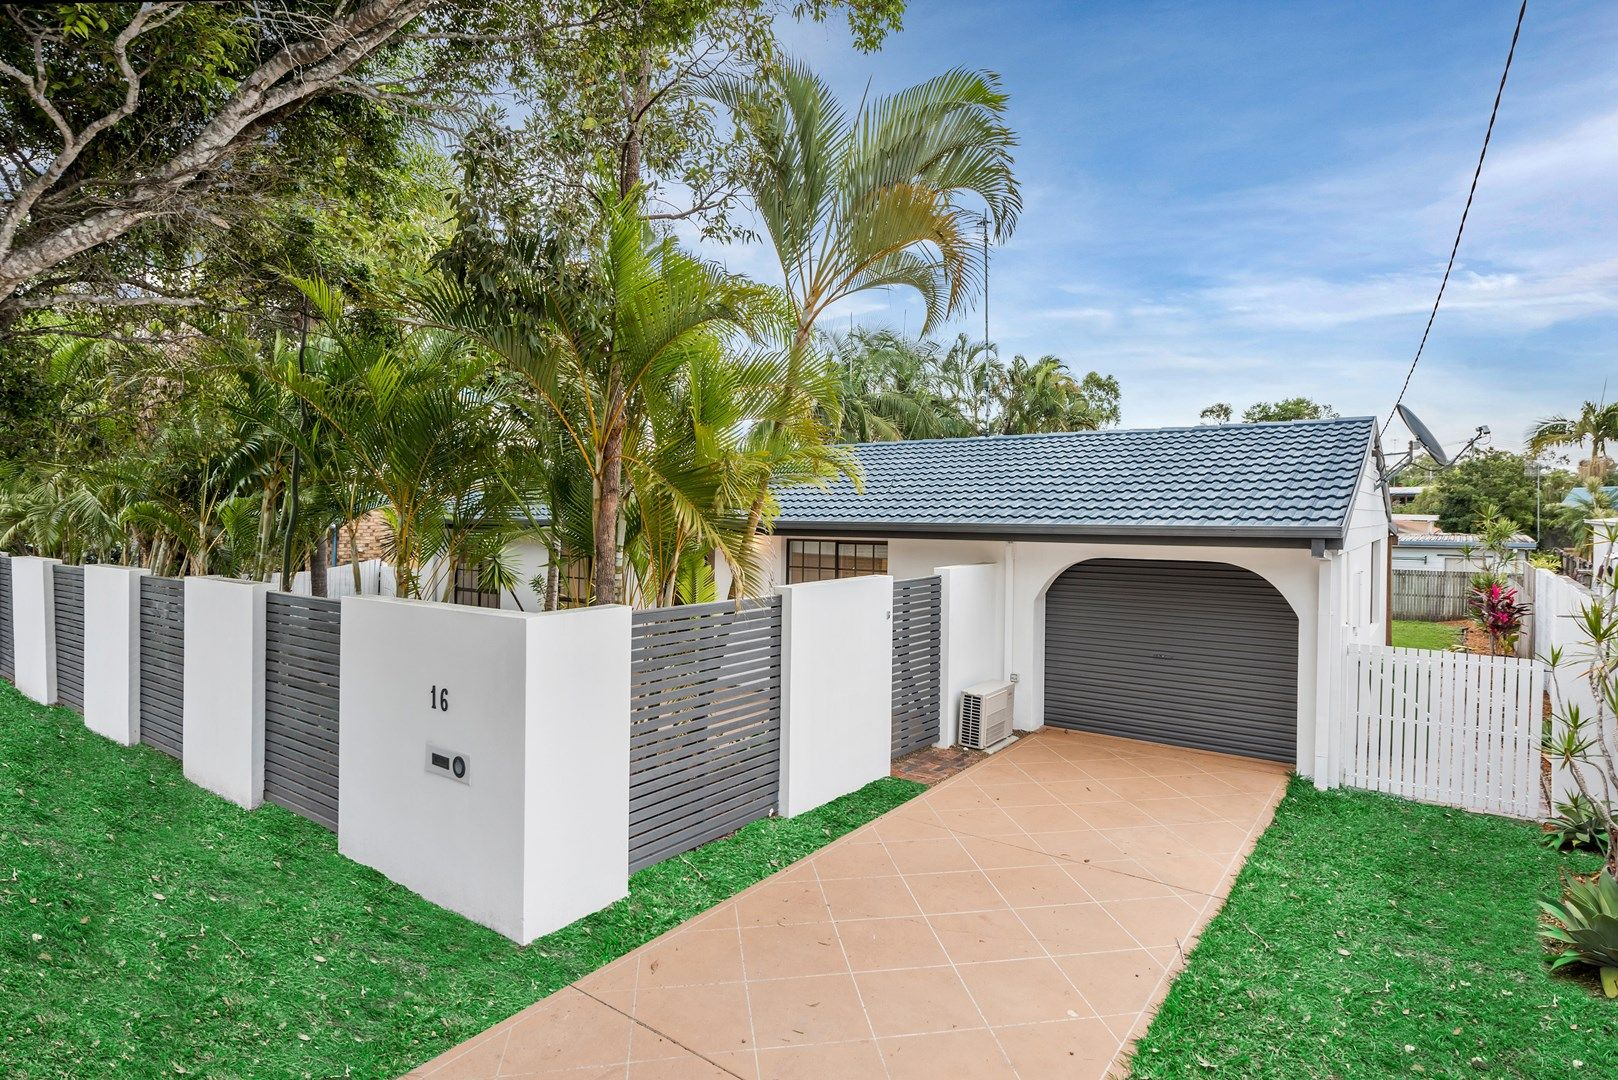 16 Sunset Drive, Noosa Heads QLD 4567, Image 0